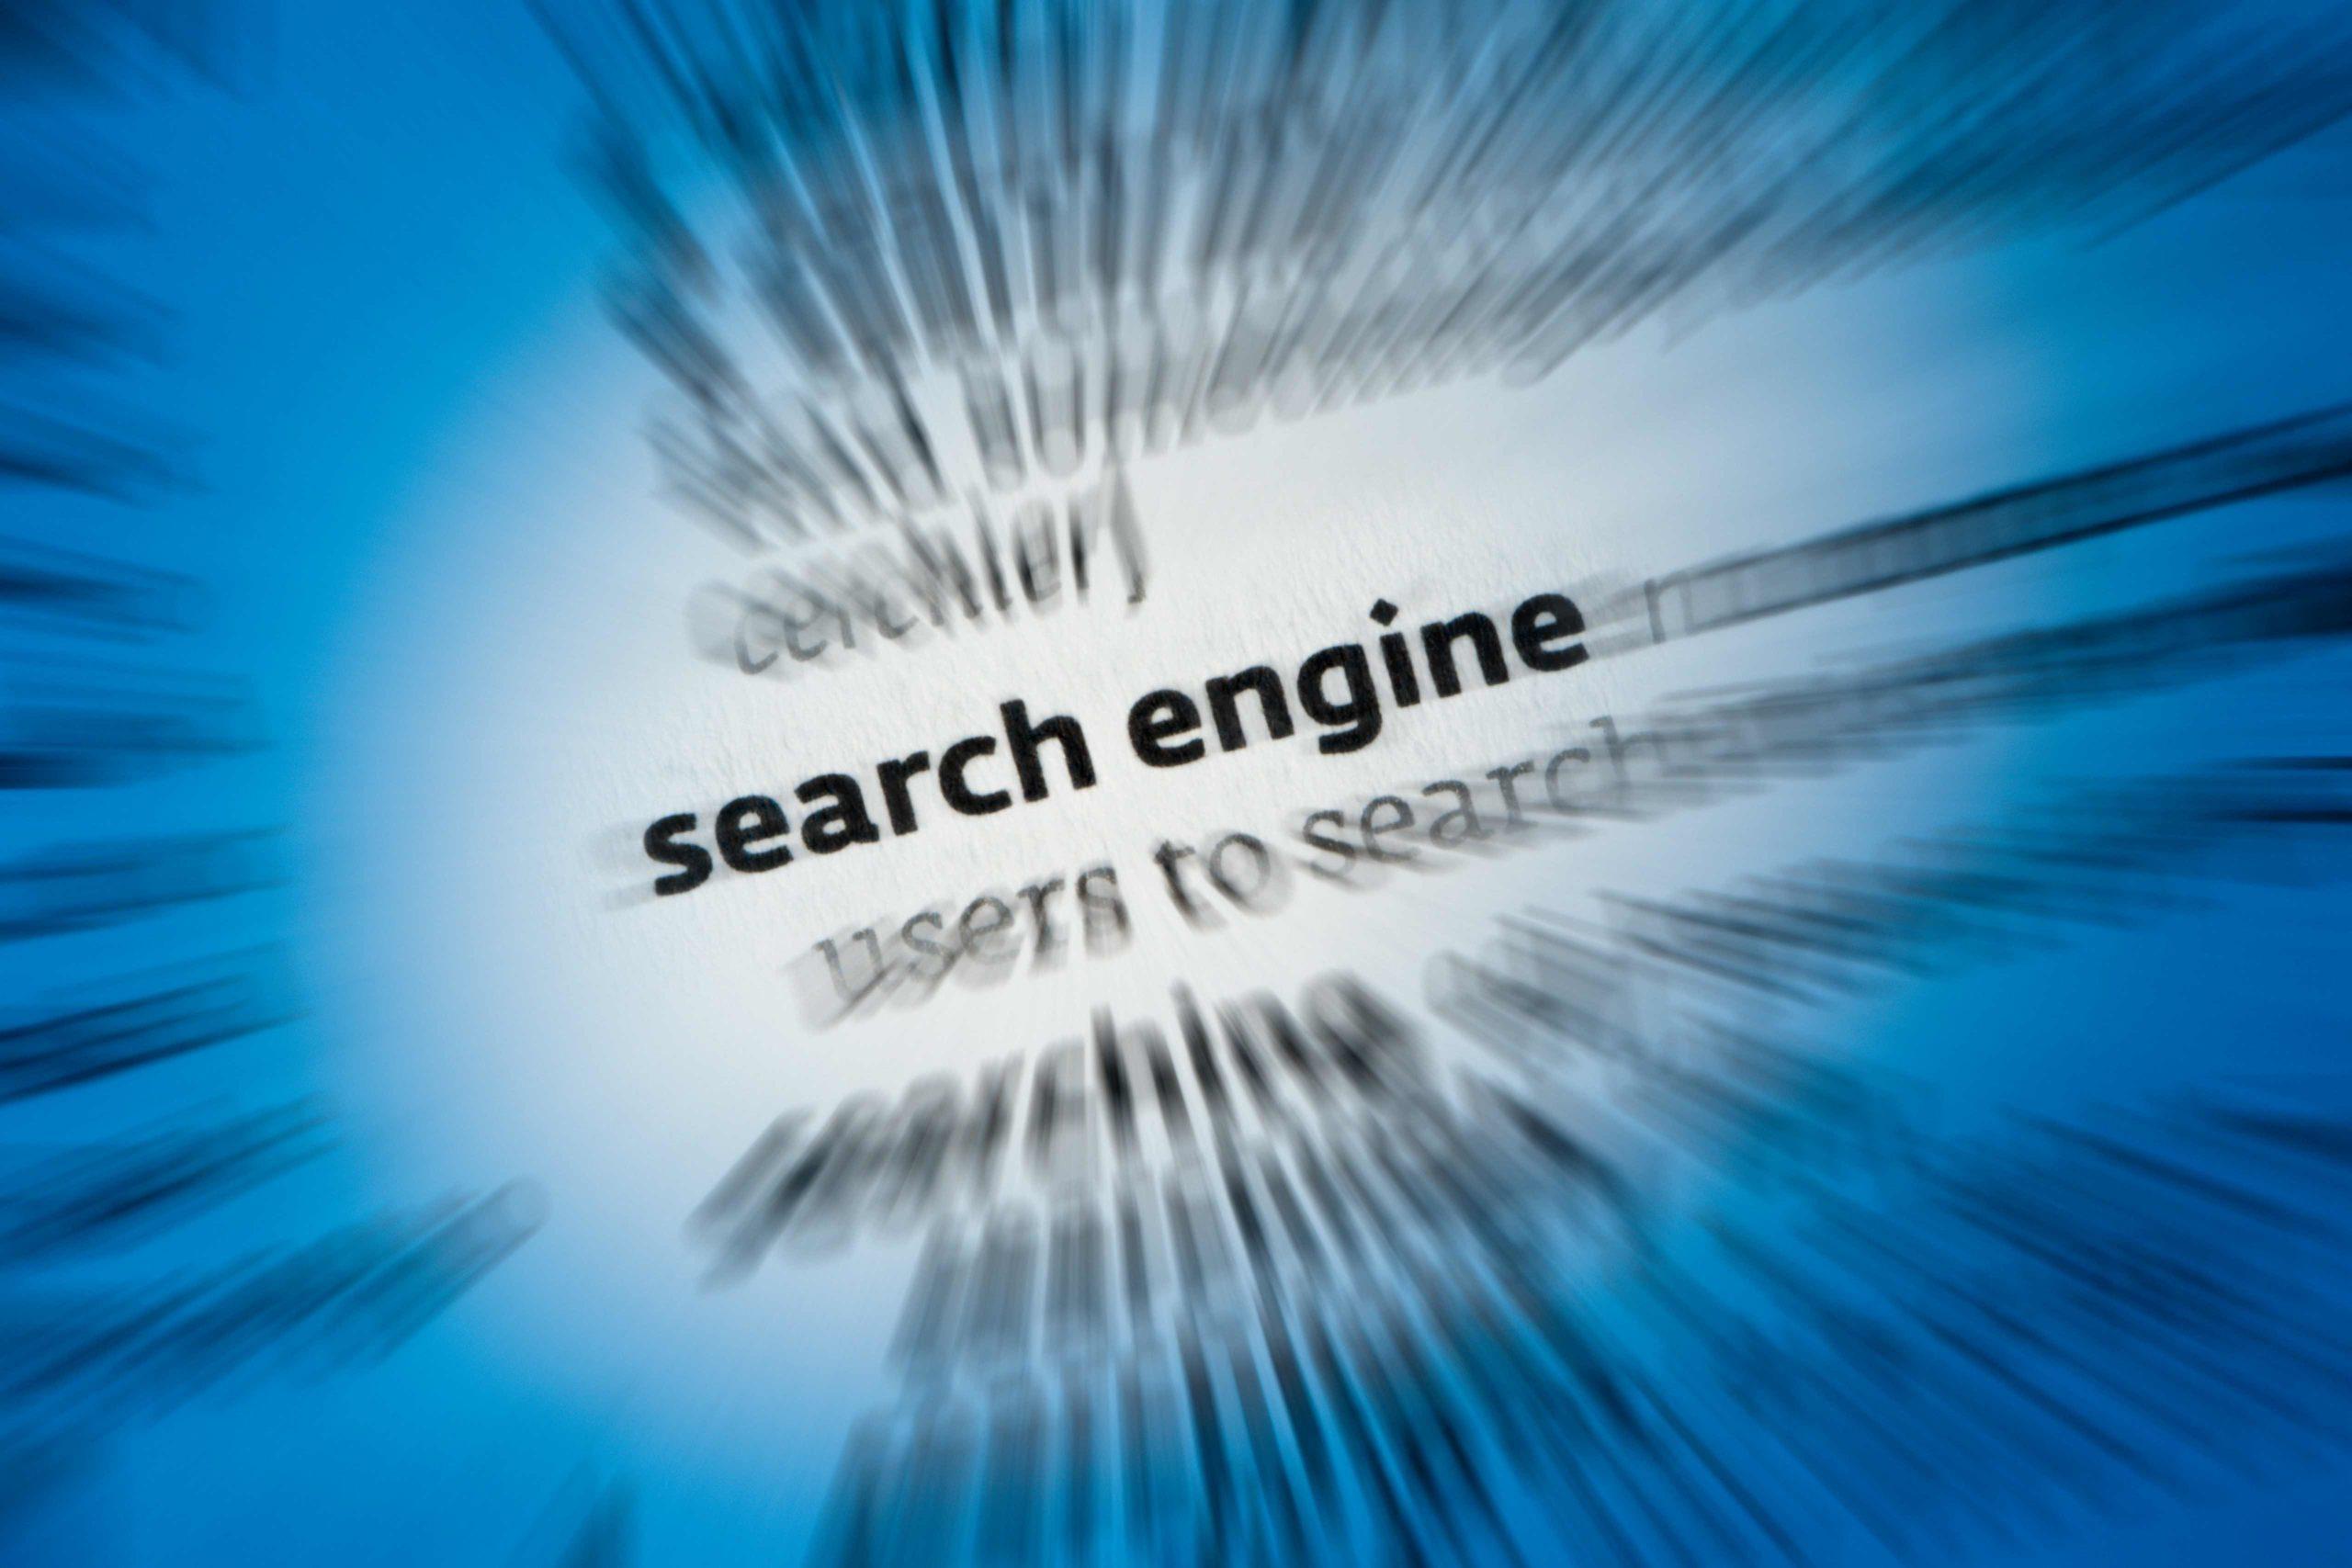 search engine a computer program by @SteveAllenPhoto-W